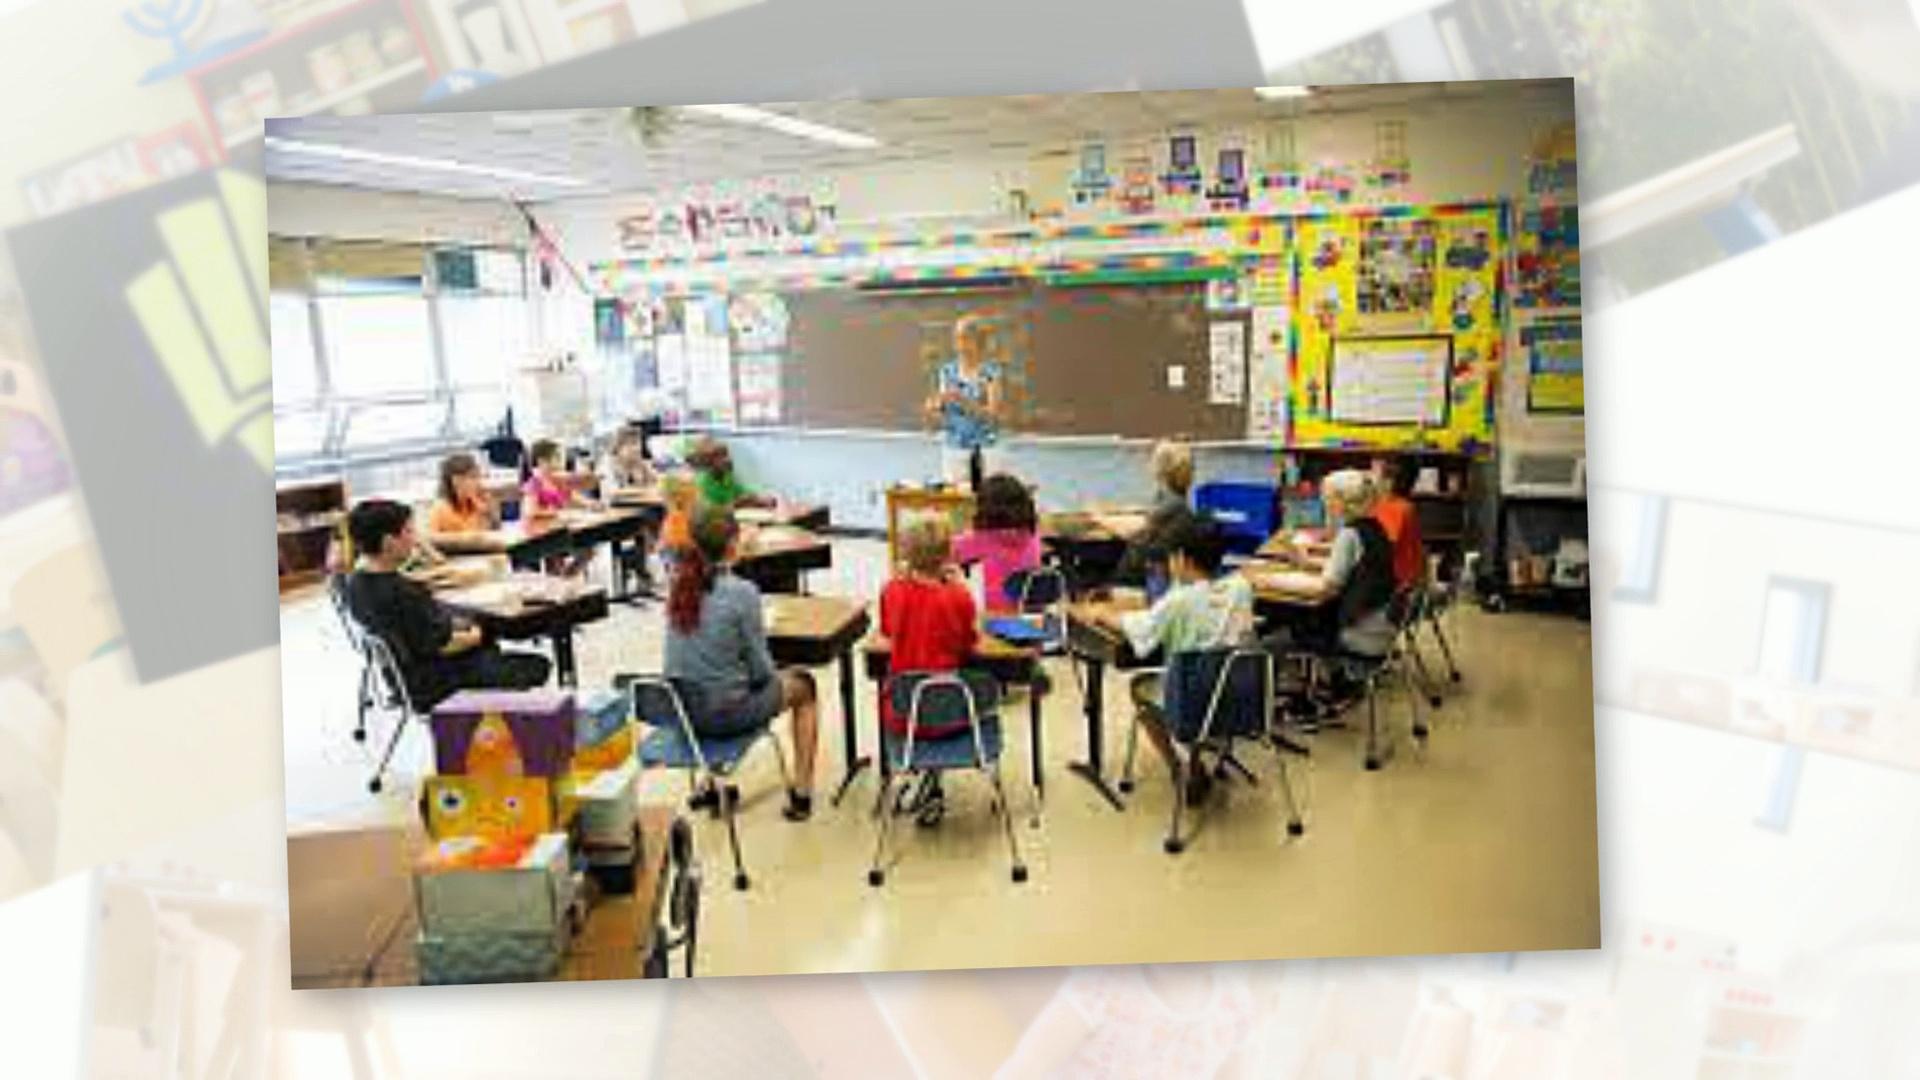 Manhattan Beach Preschool | Hermosa Beach Preschool  | Growinggardenpreschool.com